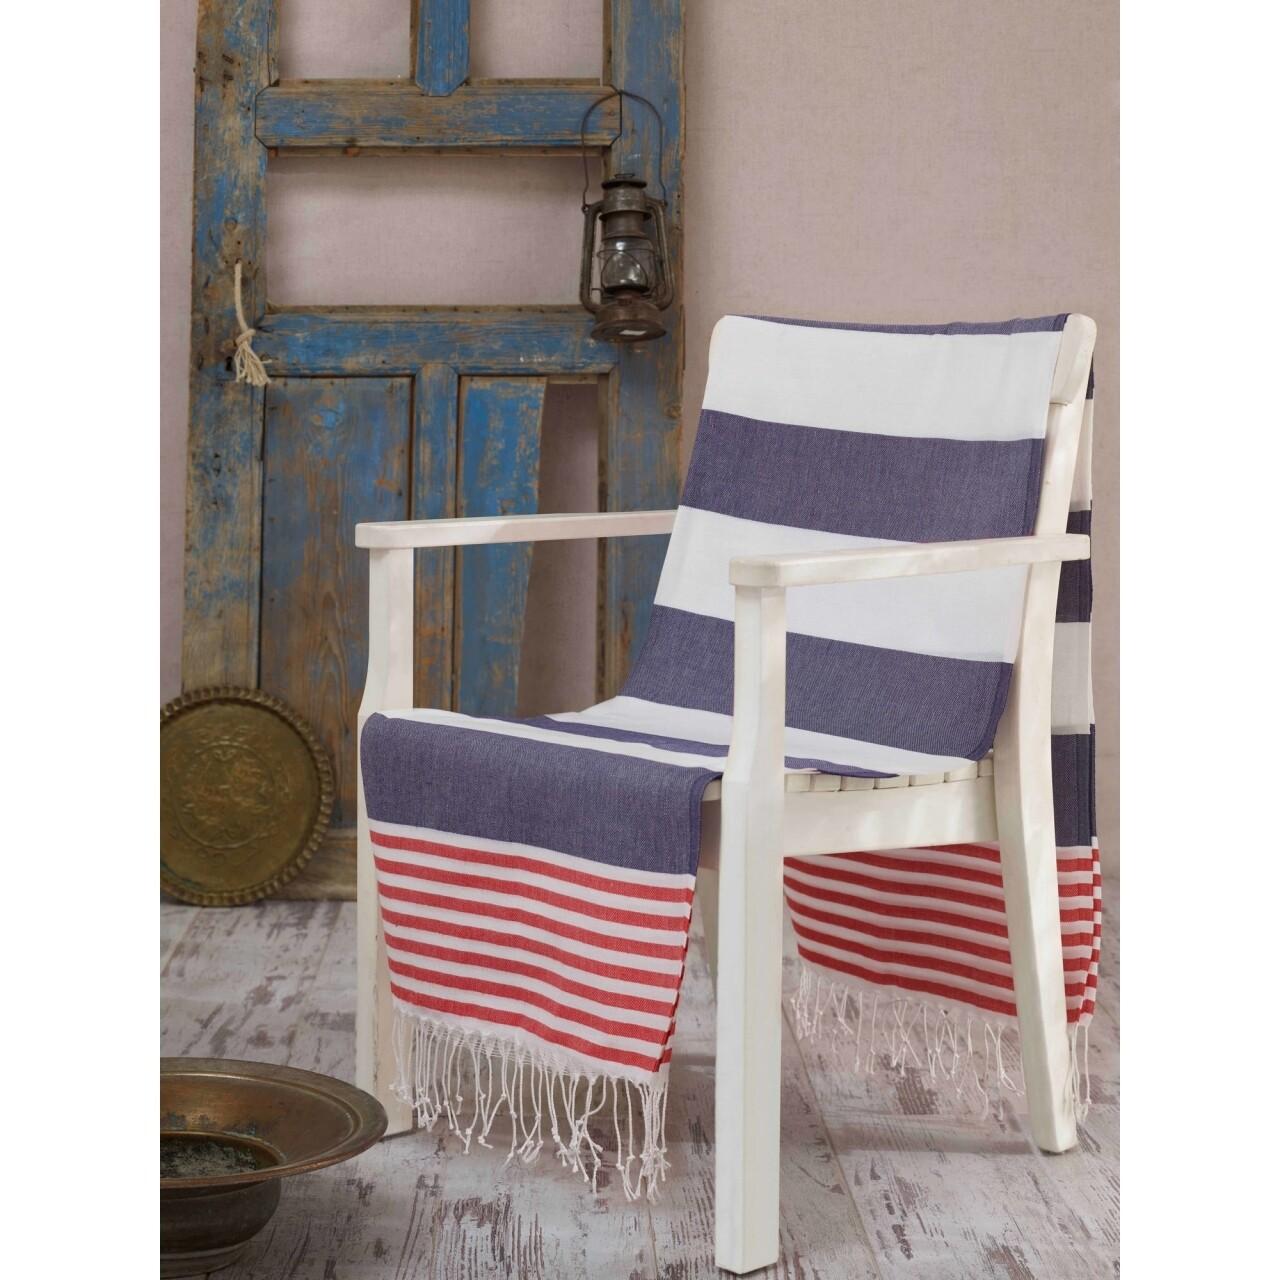 Prosop de plaja pestemal Antalya Blue, 100 x 180 cm, alb/albastru/rosu